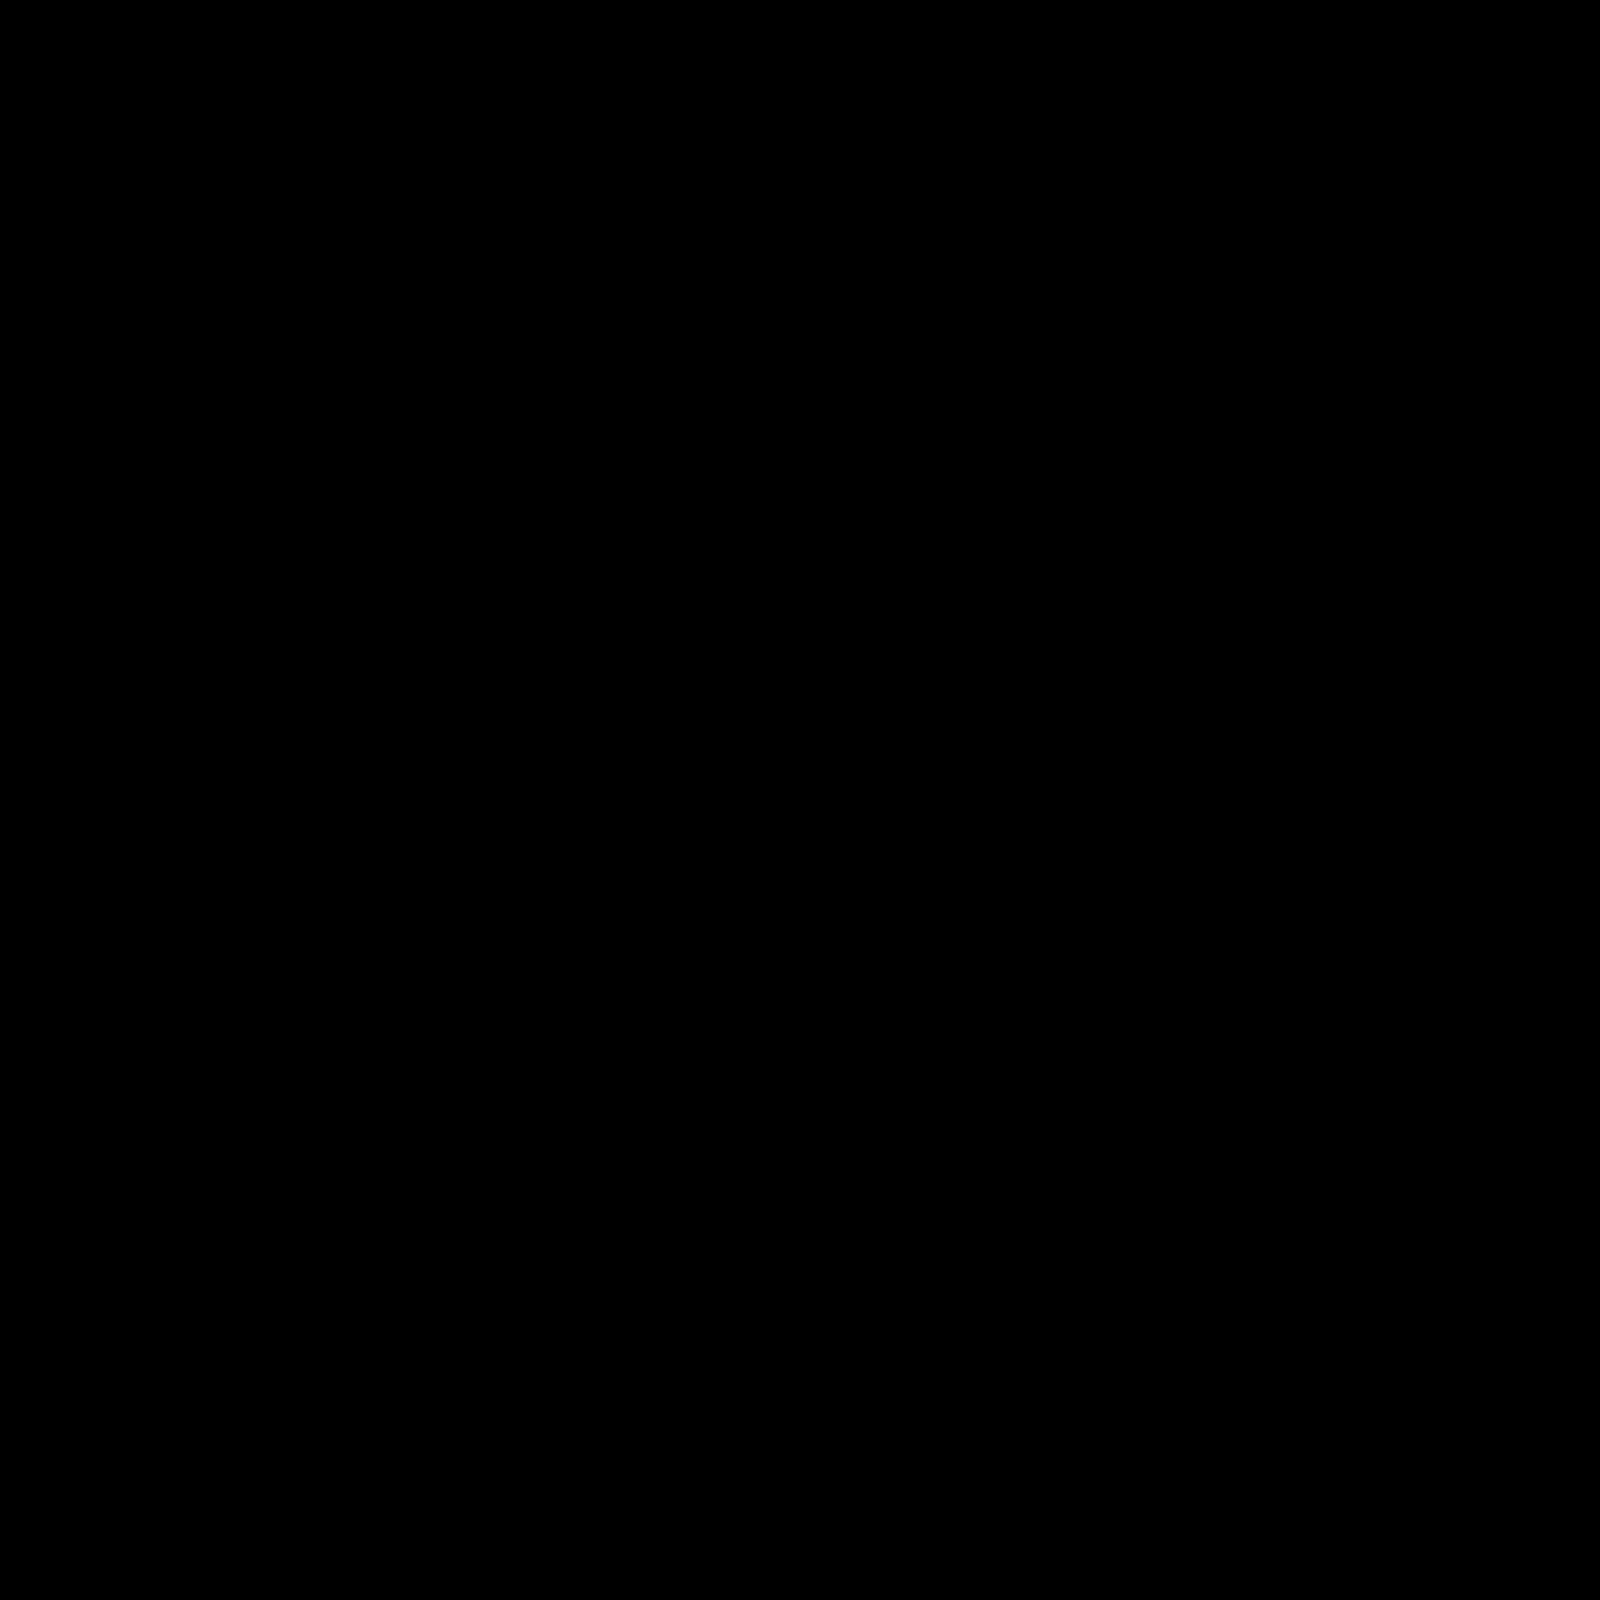 Engine clipart engineer symbol. Stepper motor icono descarga